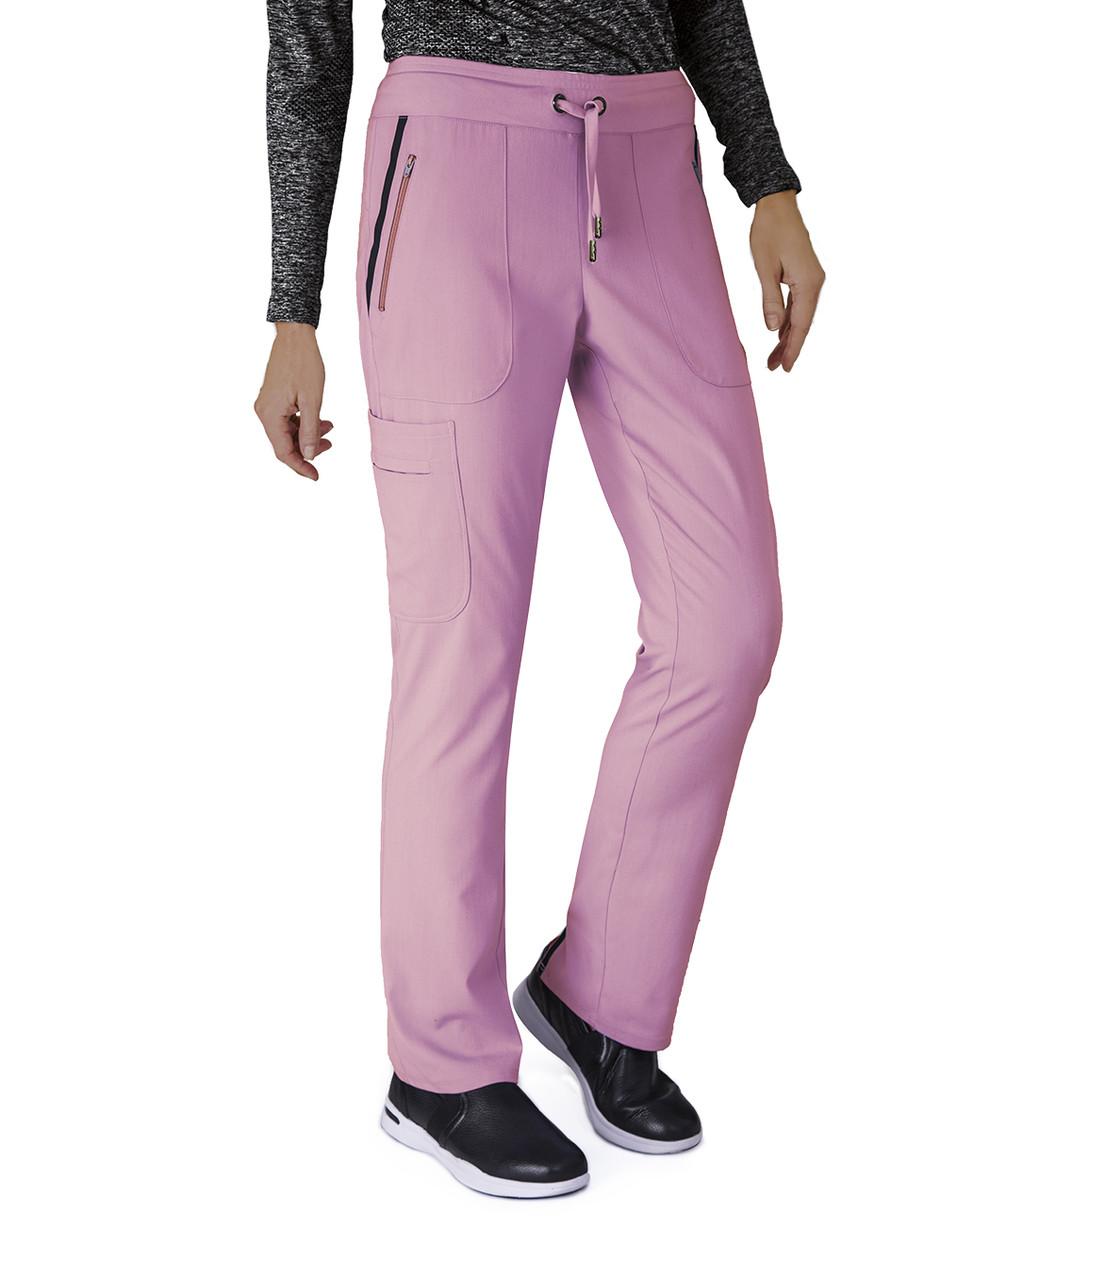 (7228P) Grey's Anatomy Impact Scrubs - Elevate 6 Pocket Cargo Pant (Petite)